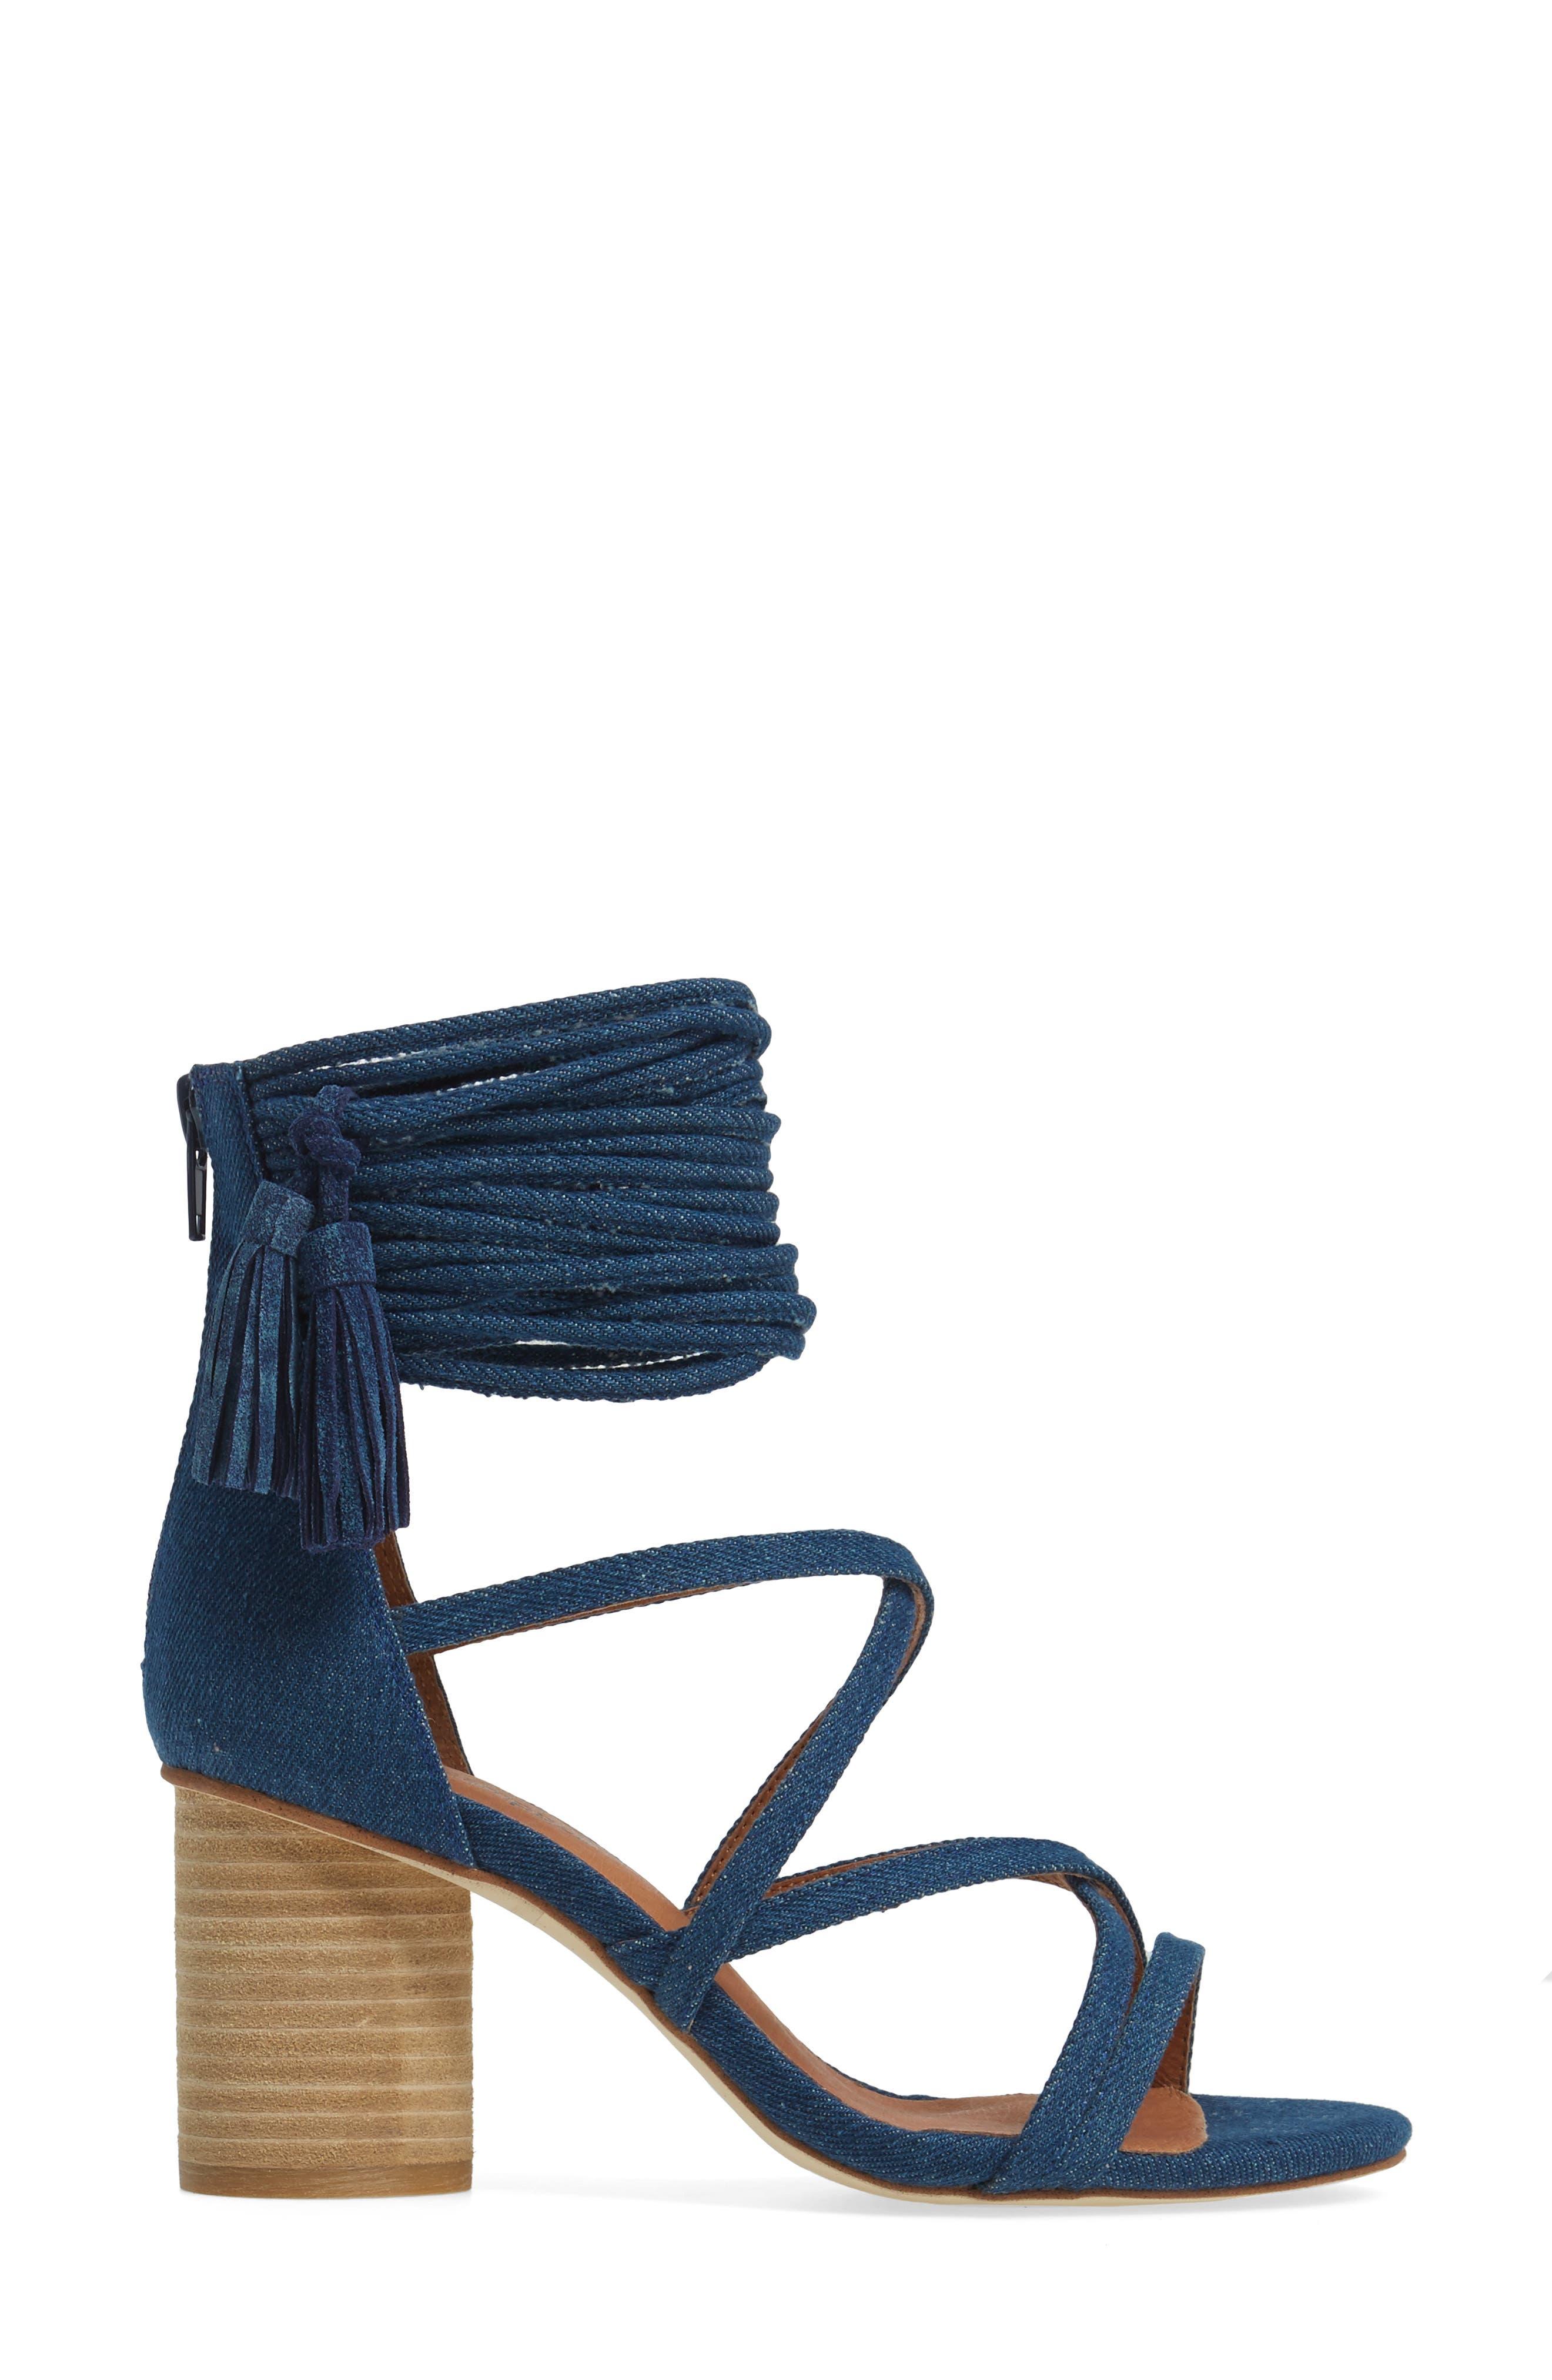 Alternate Image 3  - Jeffrey Campbell 'Despina' Strappy Sandal (Women)